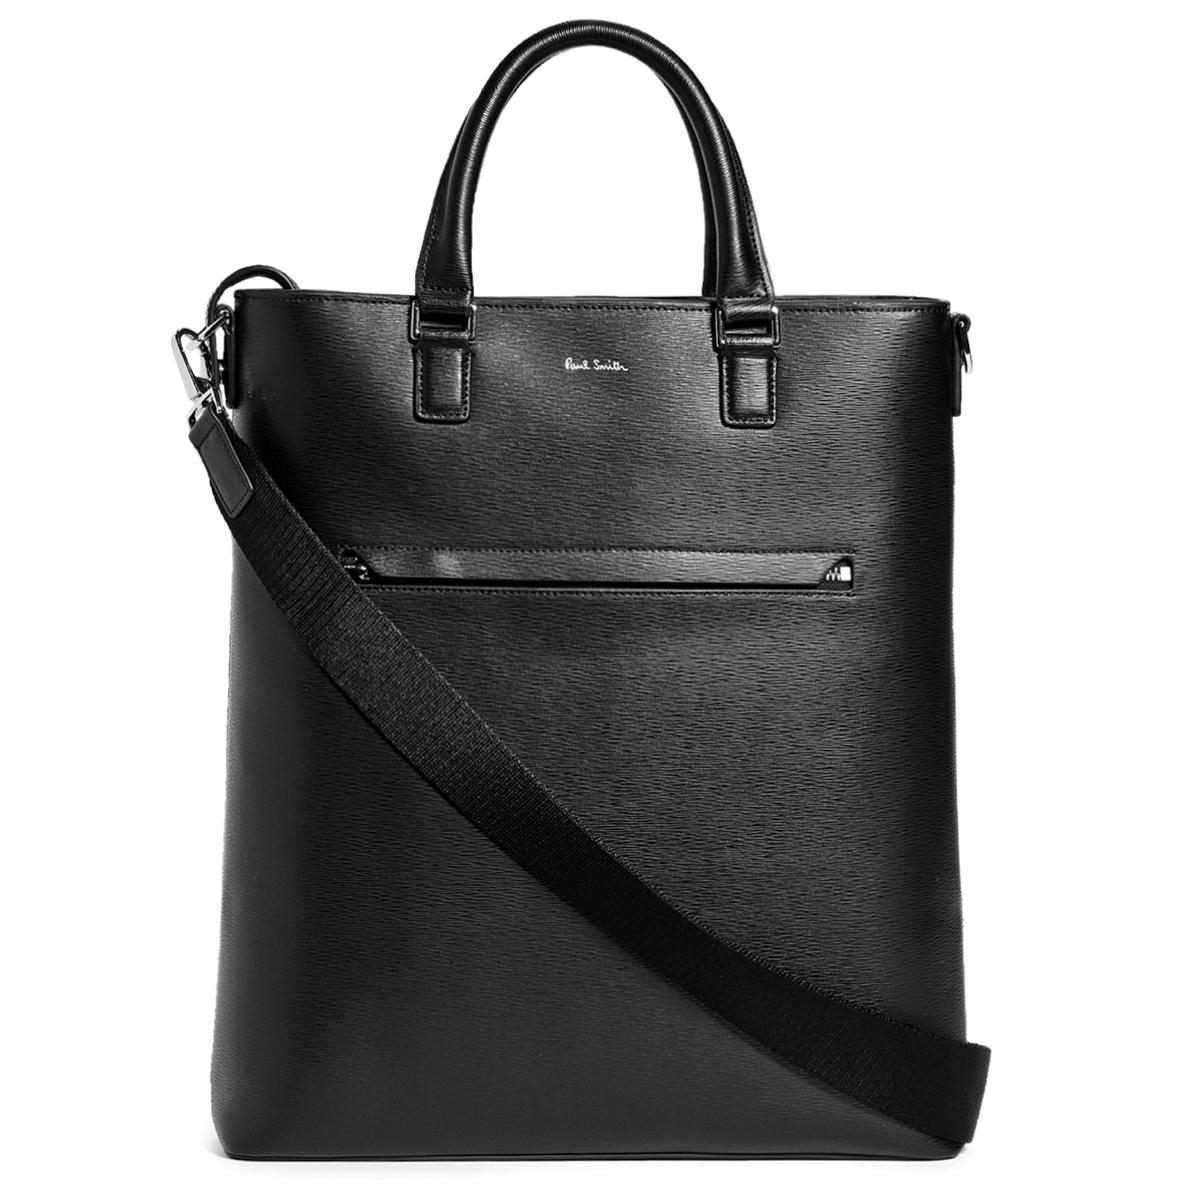 paul-smith-Black-Black-Embossed-Leather-Tote-Bag-With-bright-Stripe-Trim 1.jpg